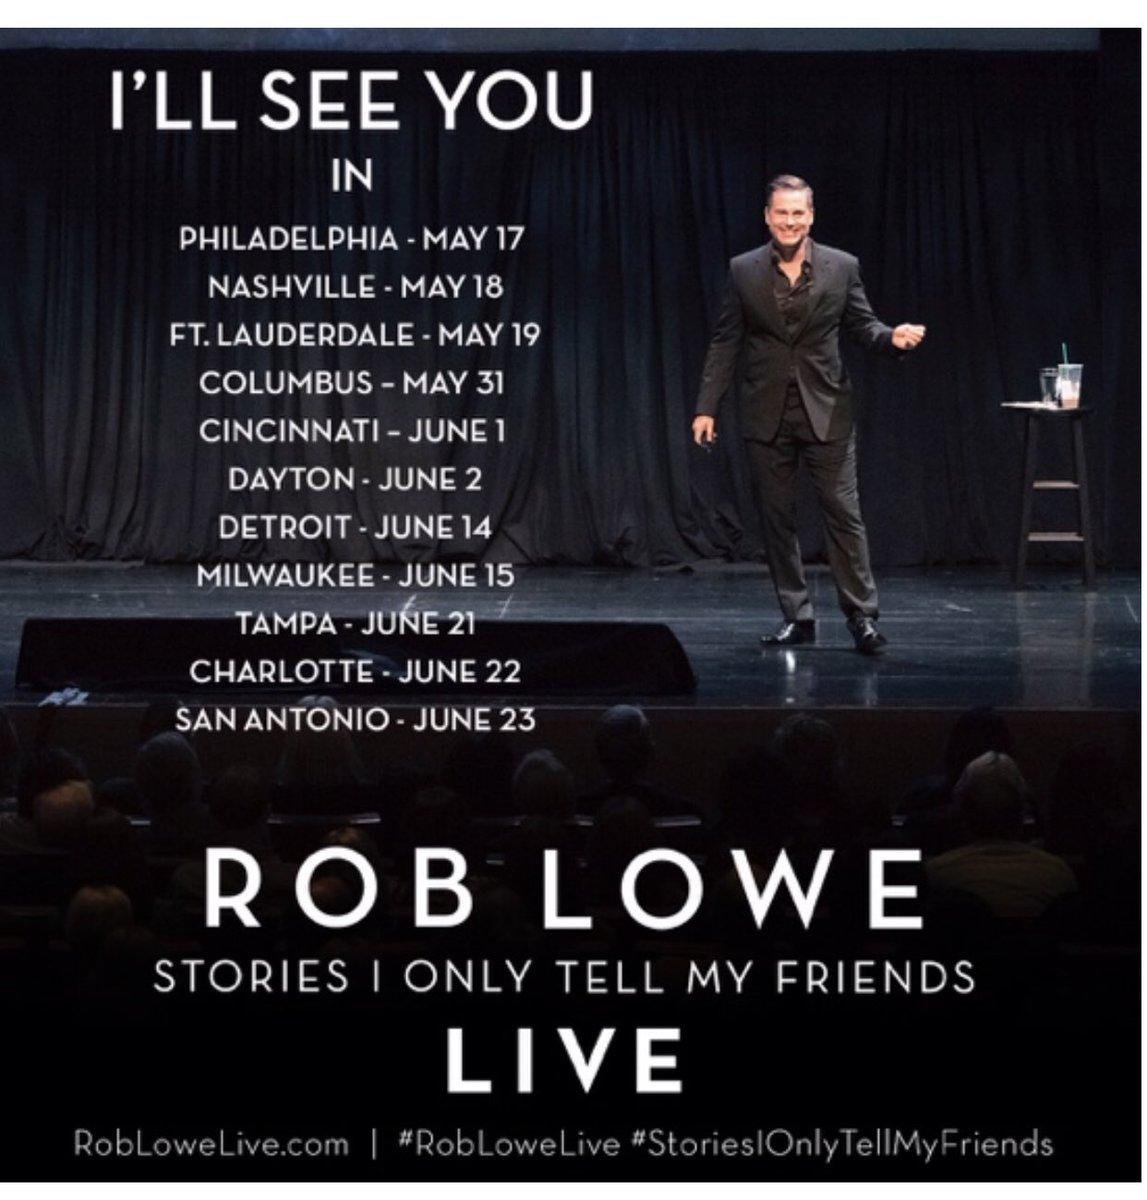 Rob Lowe on Twitter: